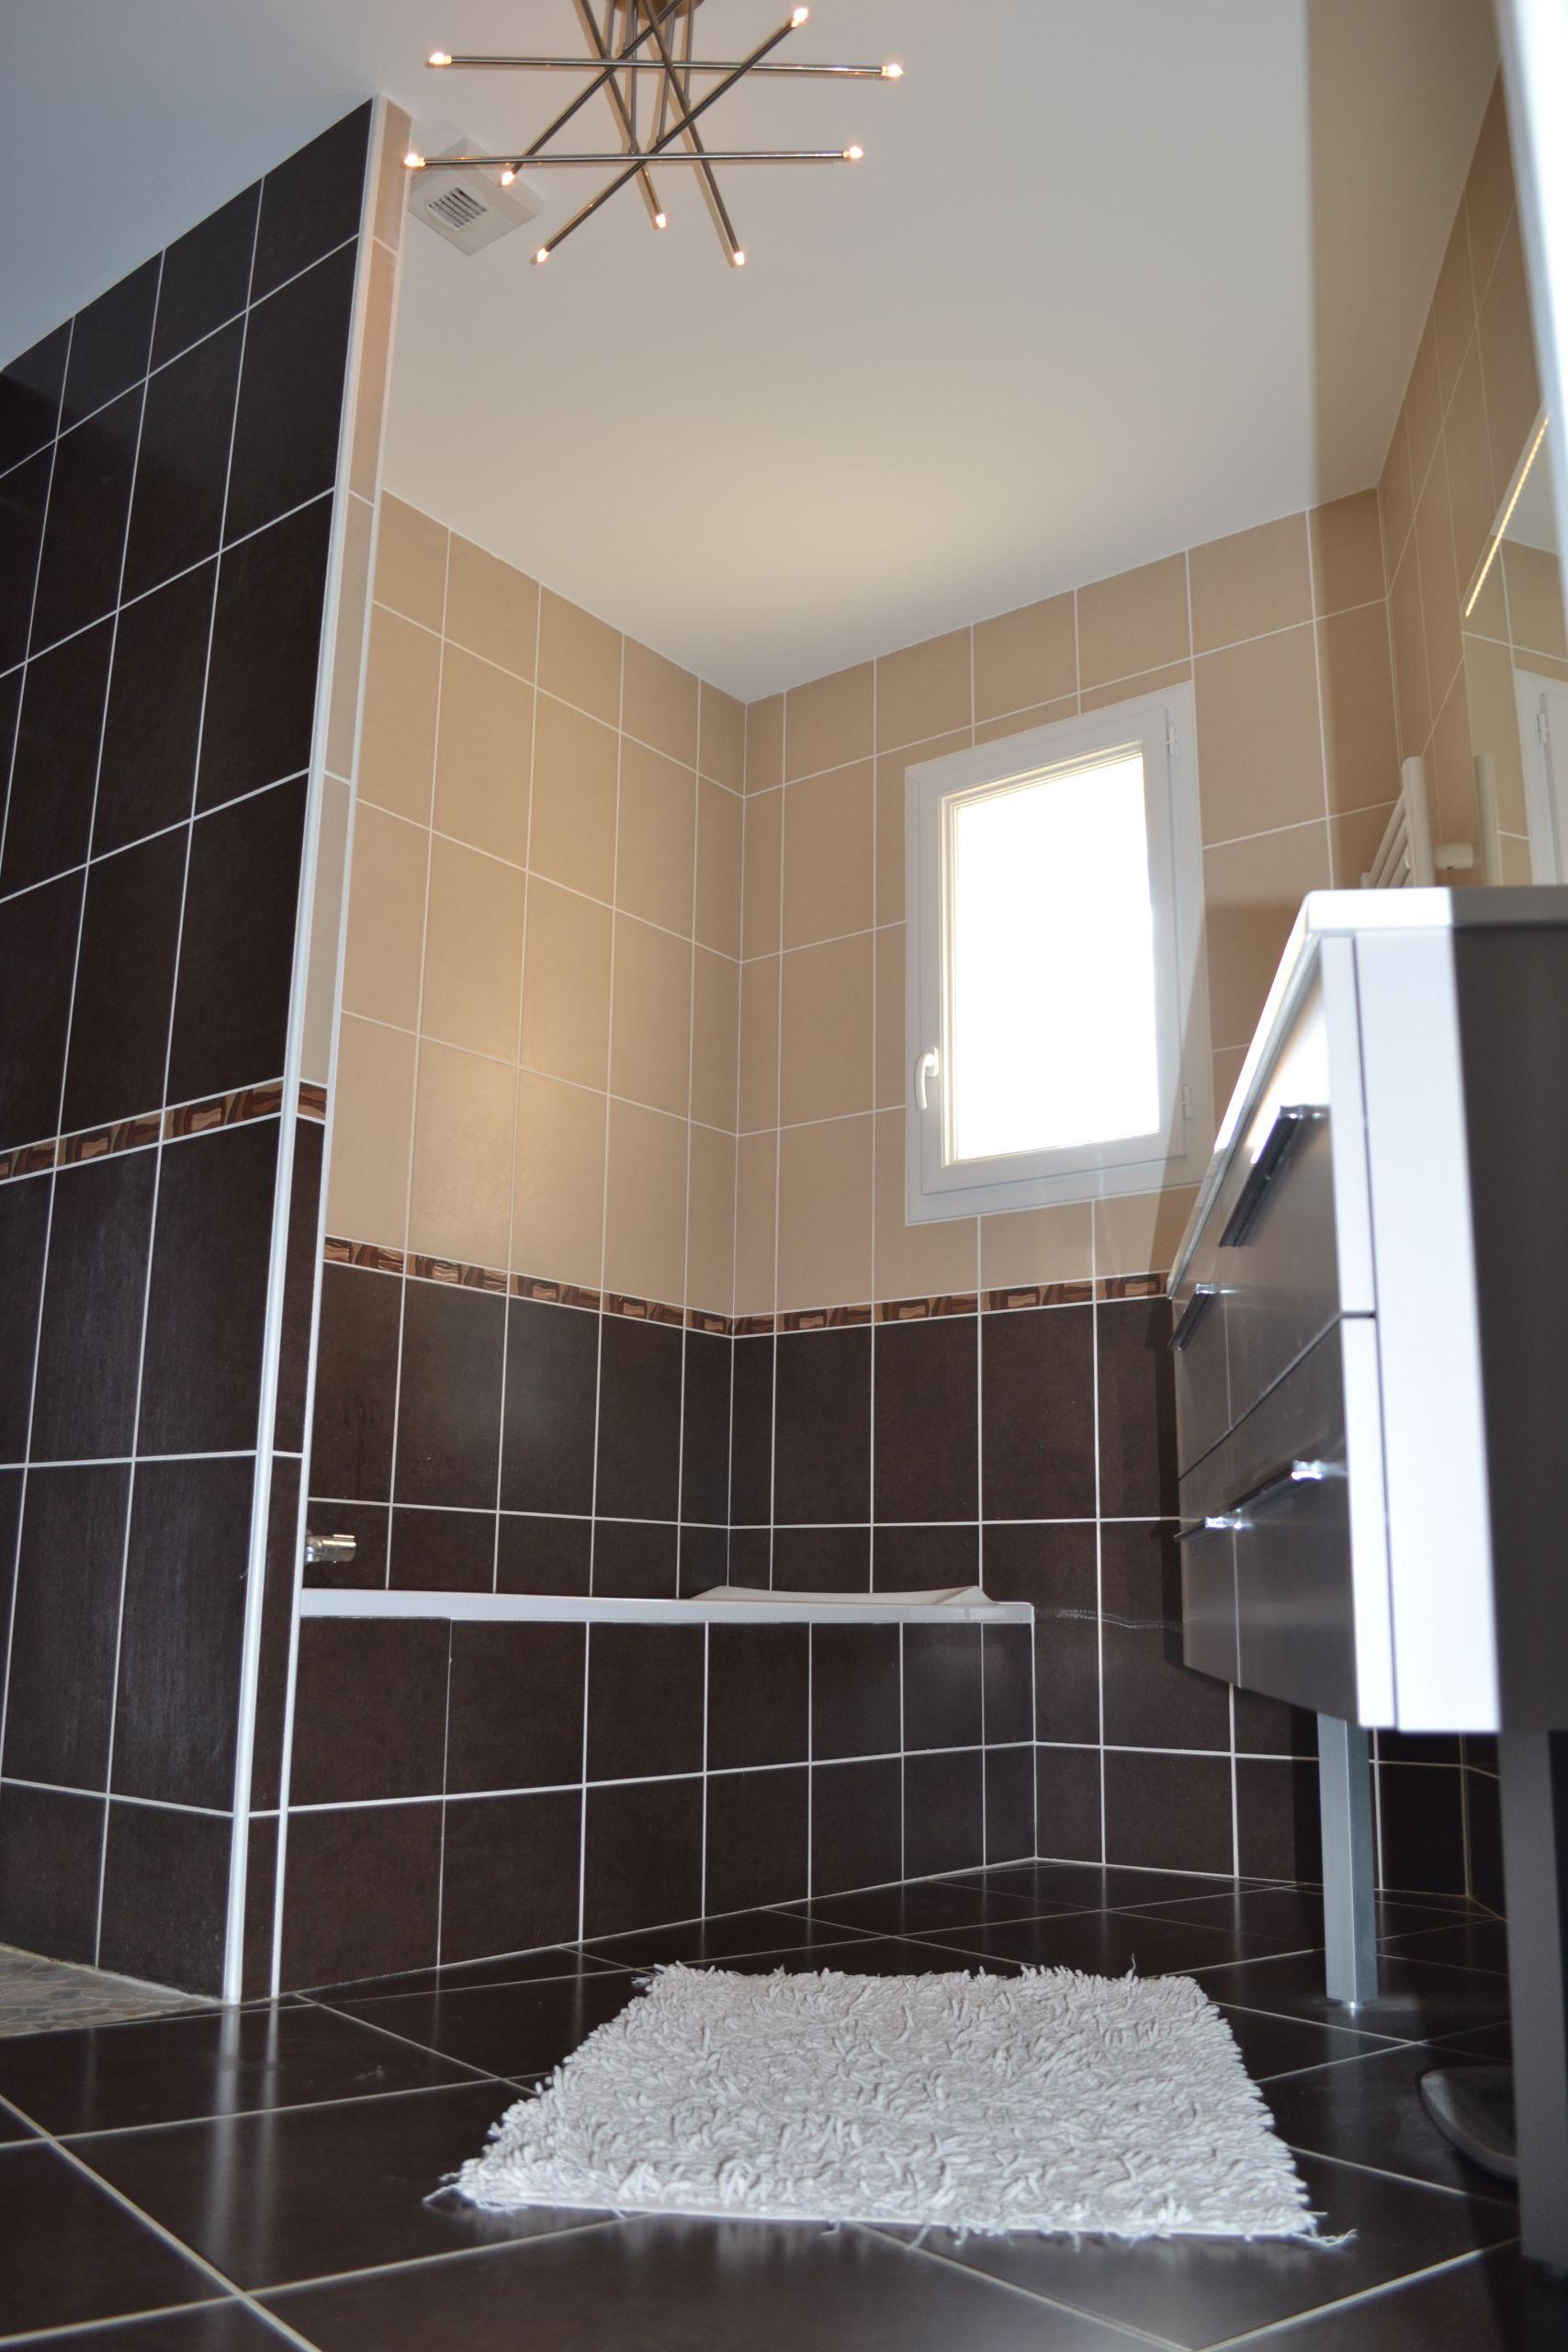 Carrelage Beige Et Marron salle de bain marron salle de bain marron et beige photo 3 7